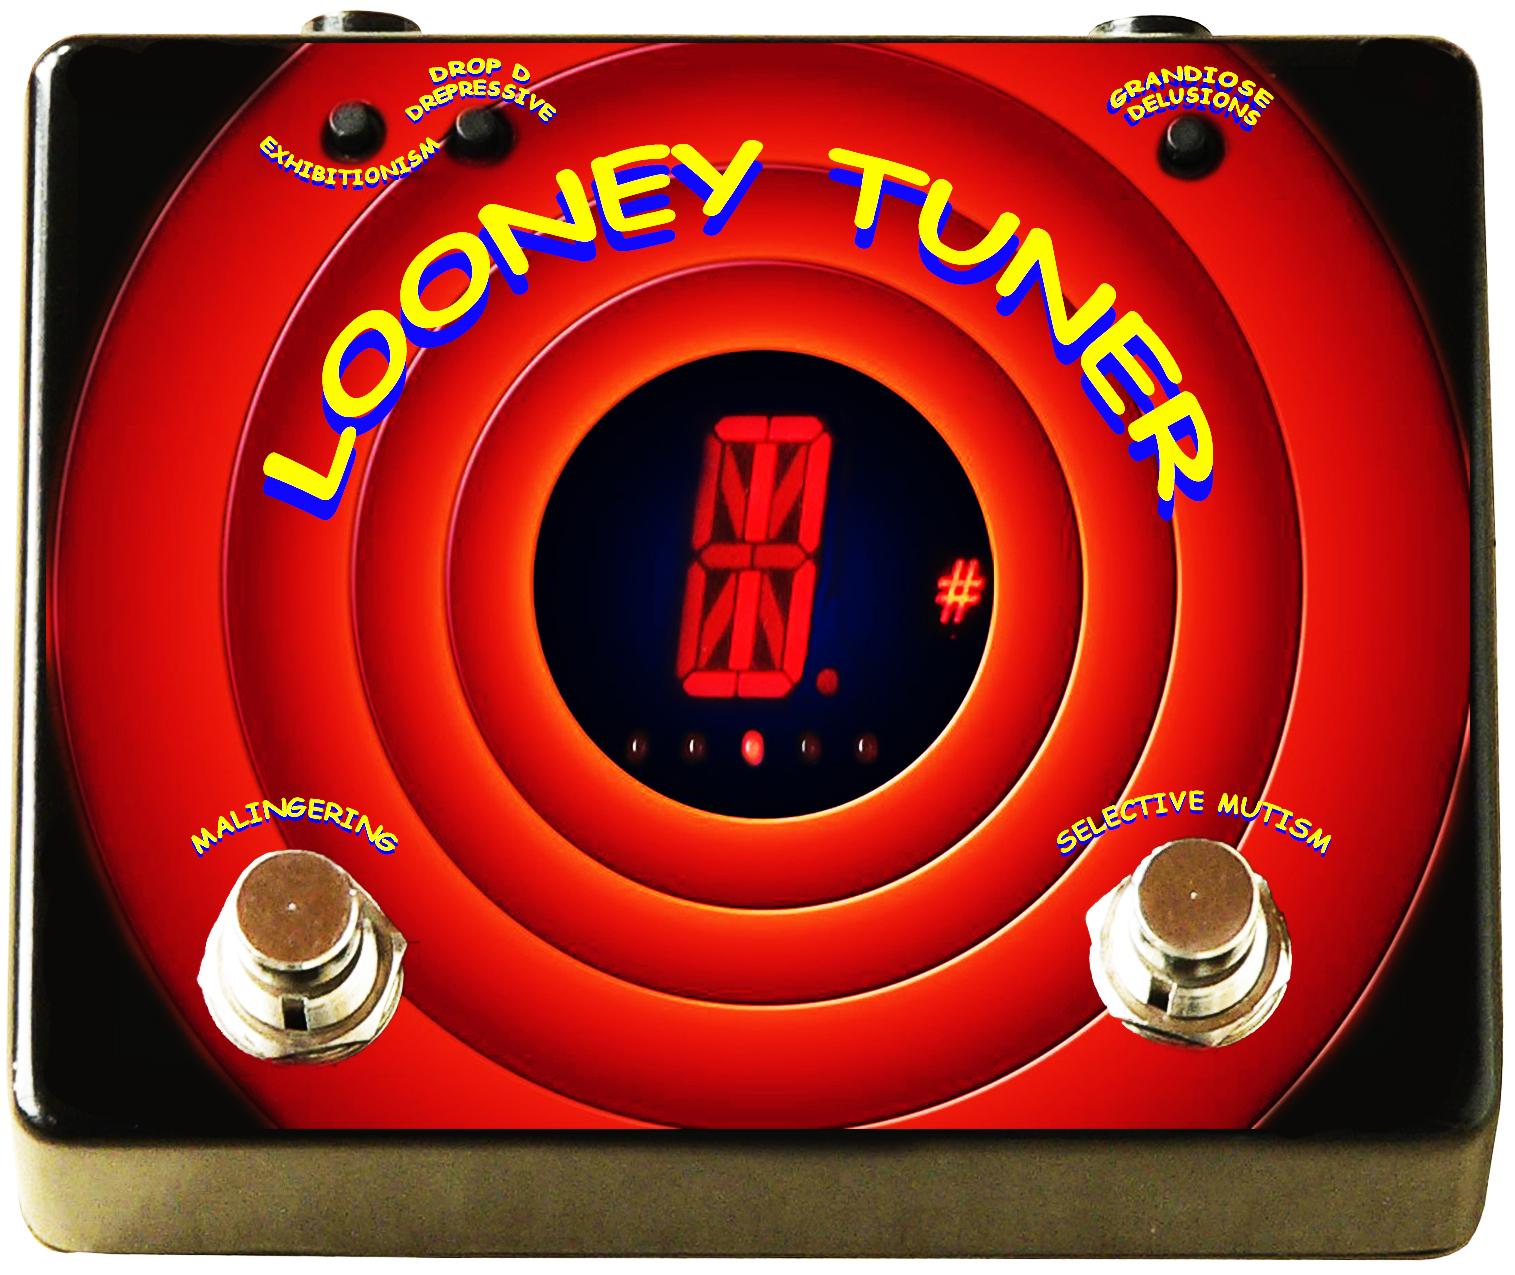 LOONEY-TUNER